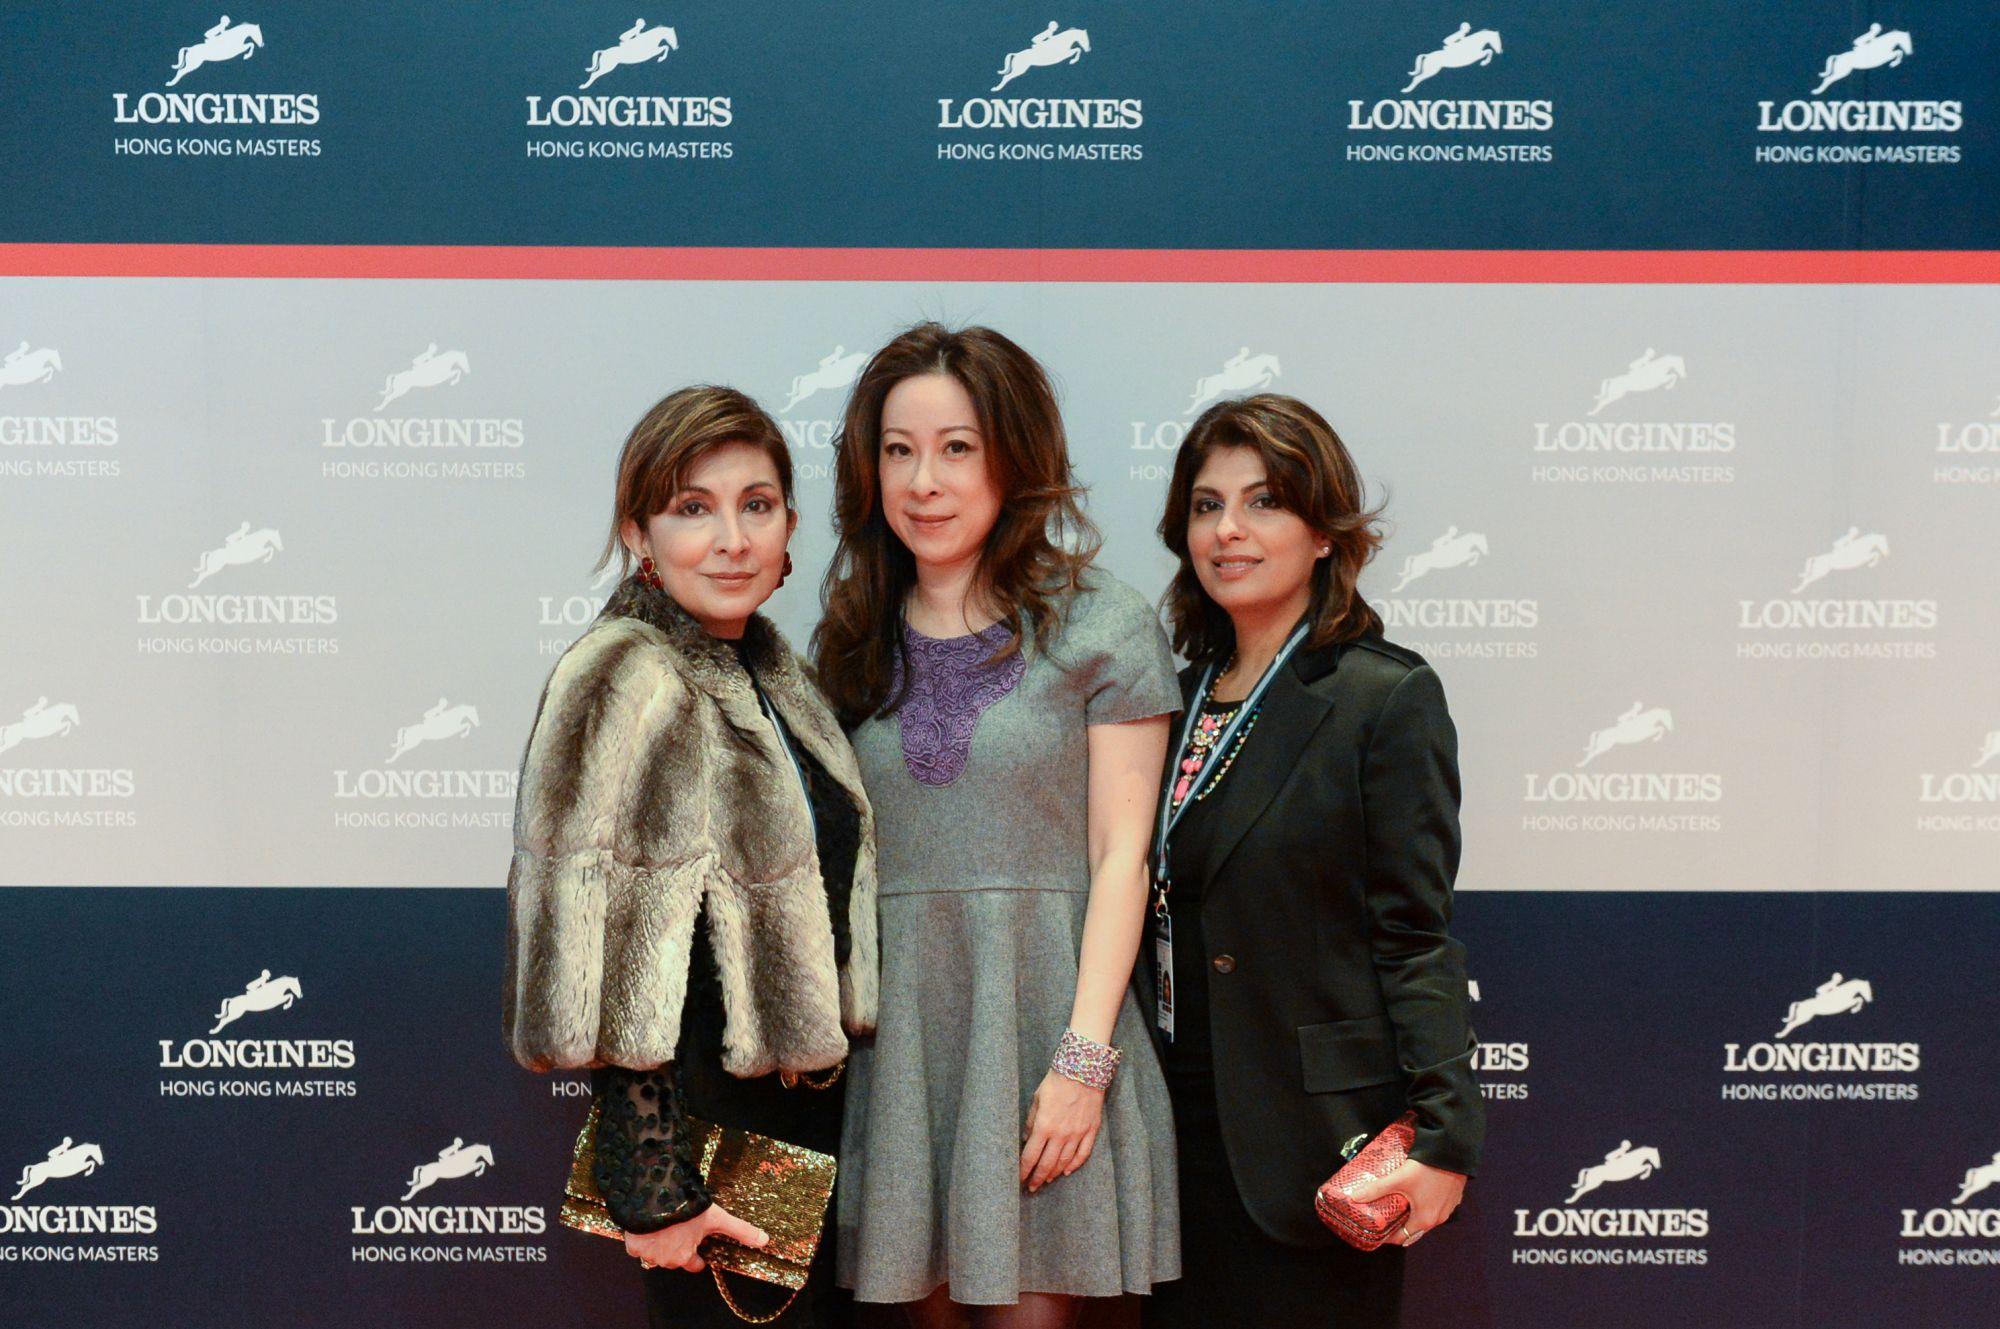 Shirley Hiranand, Janice Chan-Choy and Reyna Harilela